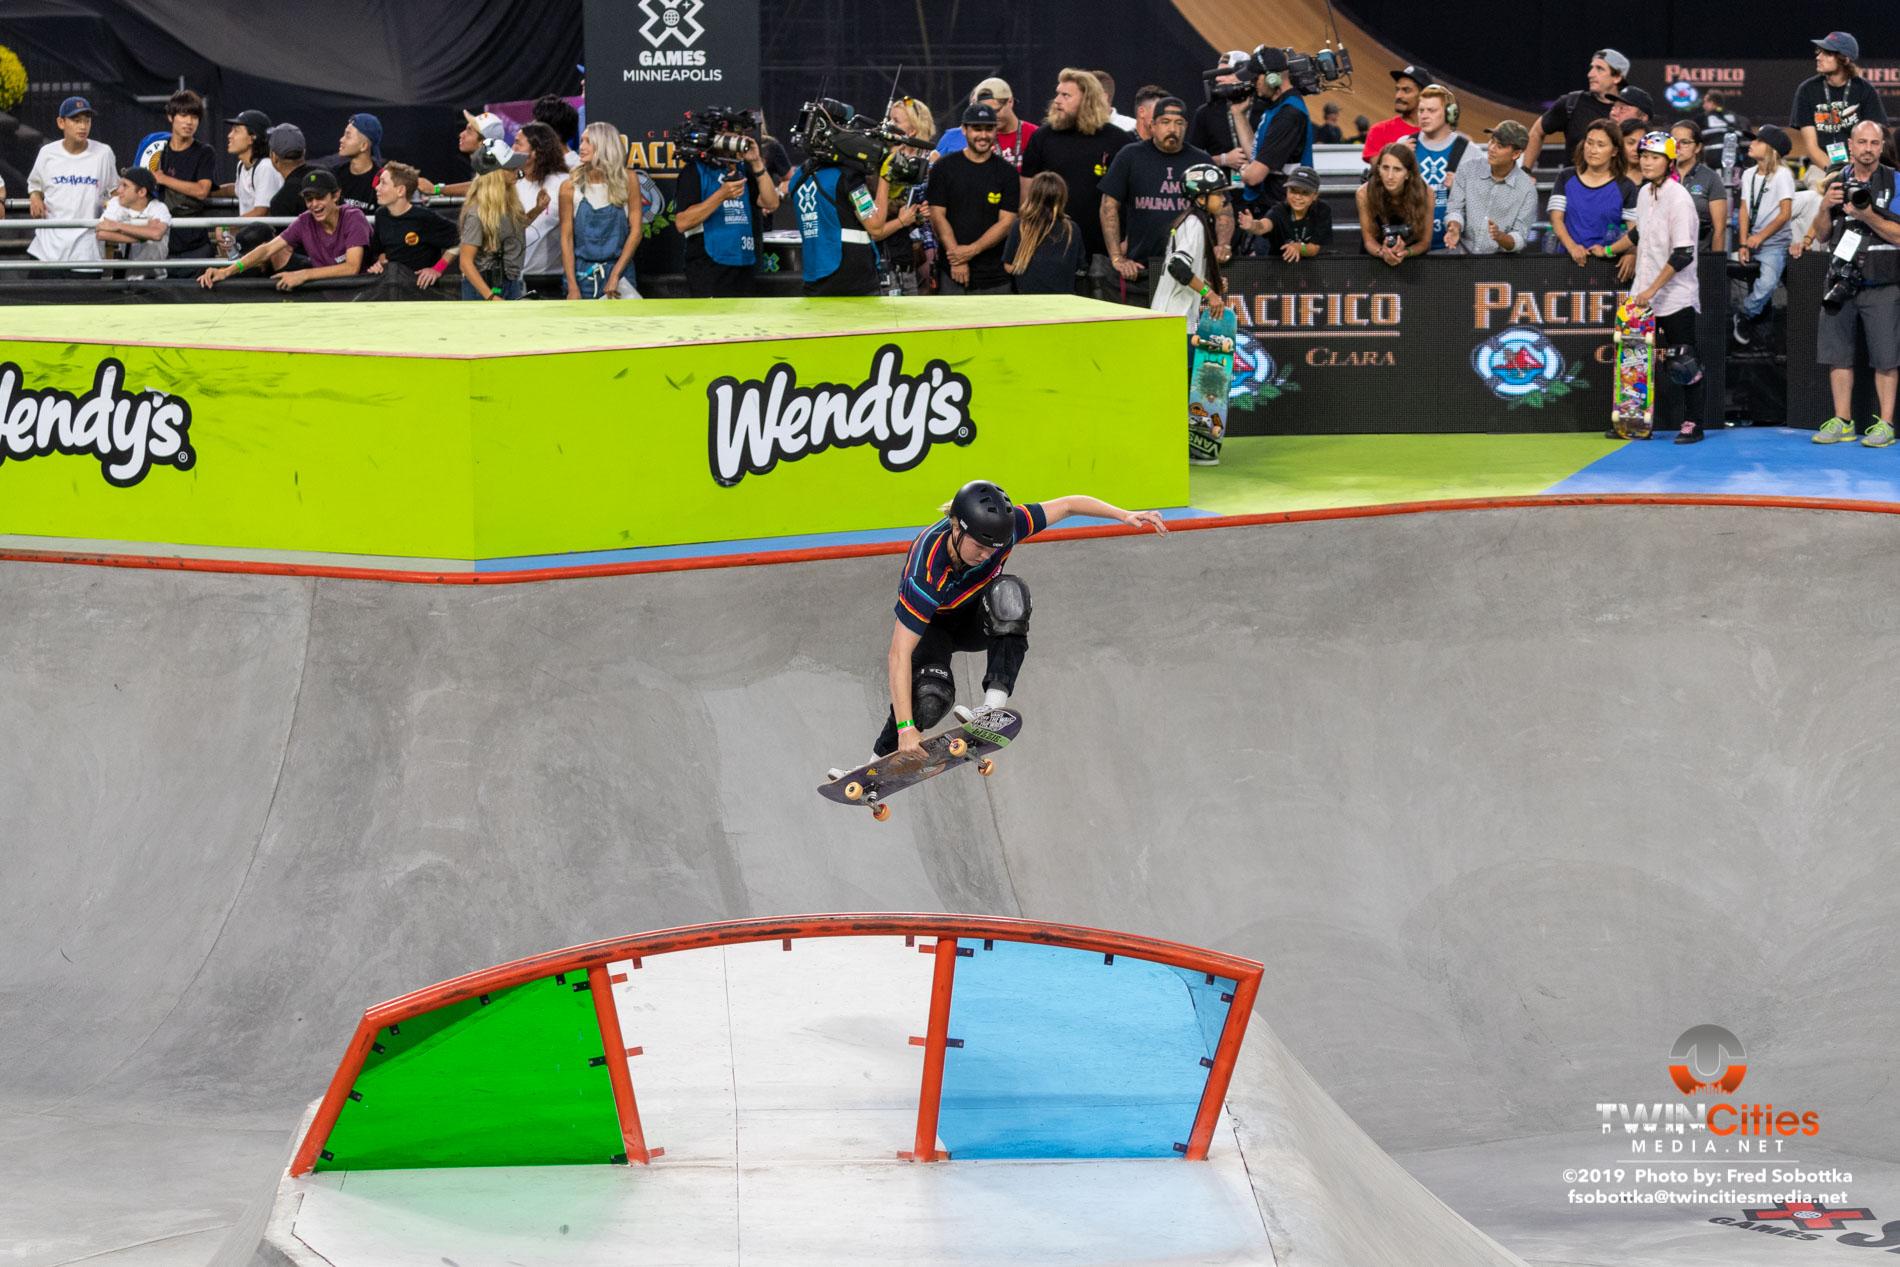 Womens-Skateboard-Park-07